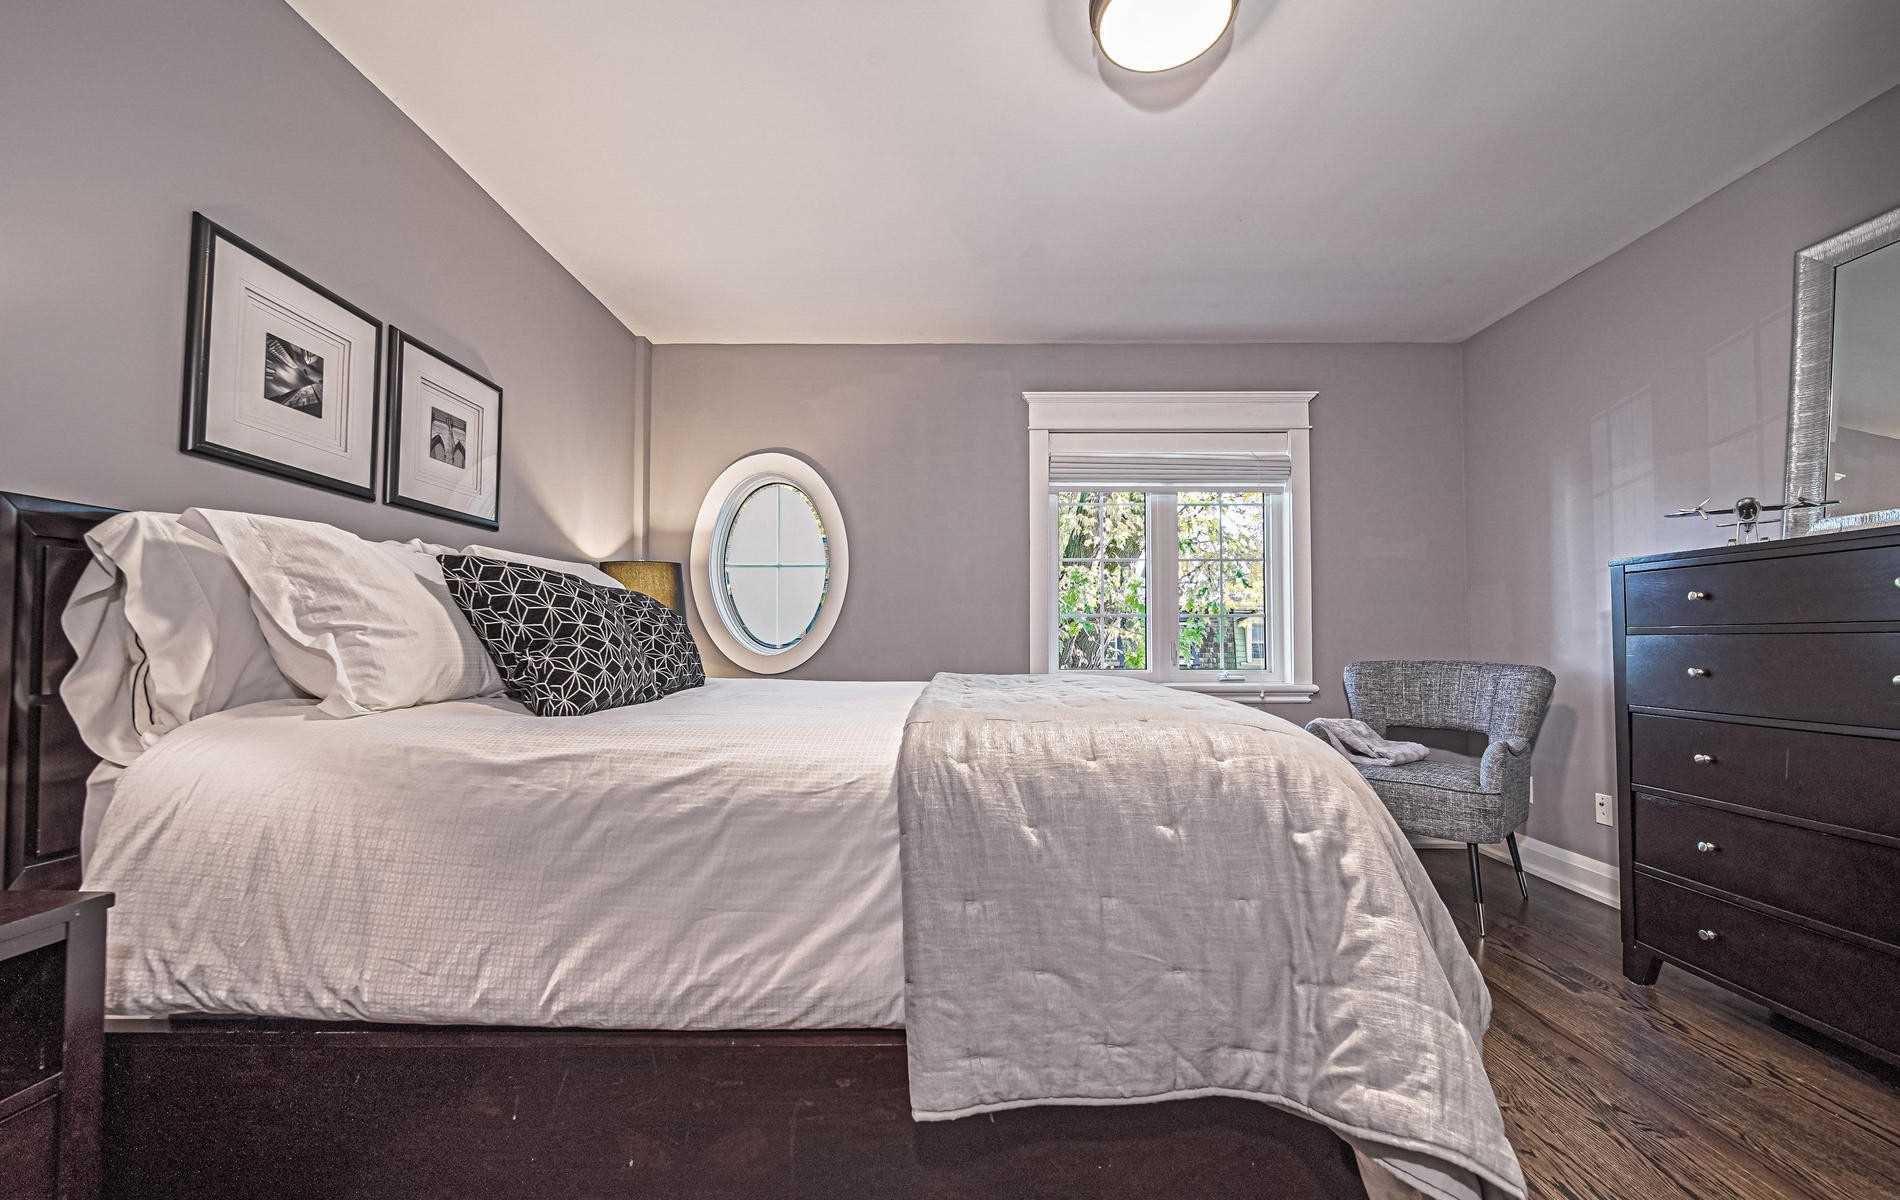 Photo 10: Photos: 216A Hamilton Street in Toronto: South Riverdale House (3-Storey) for sale (Toronto E01)  : MLS®# E4619870